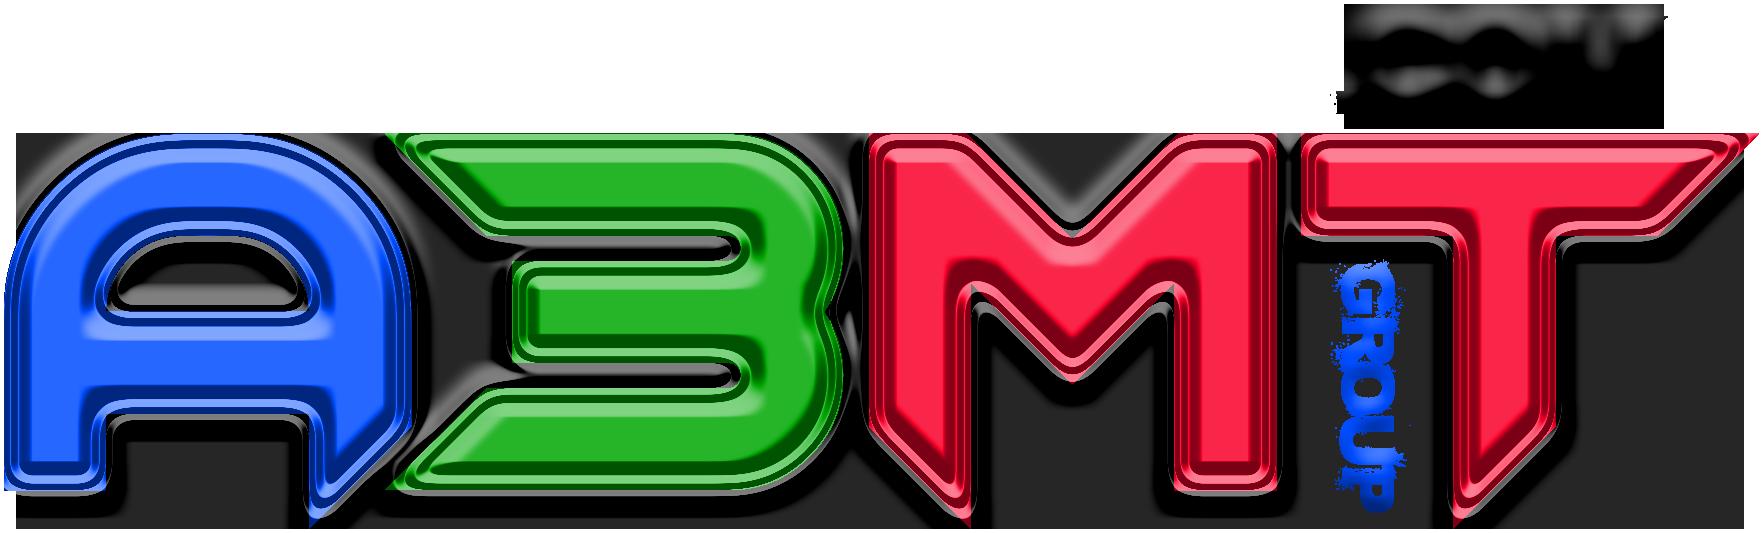 گروه تخصصی A3MT.com